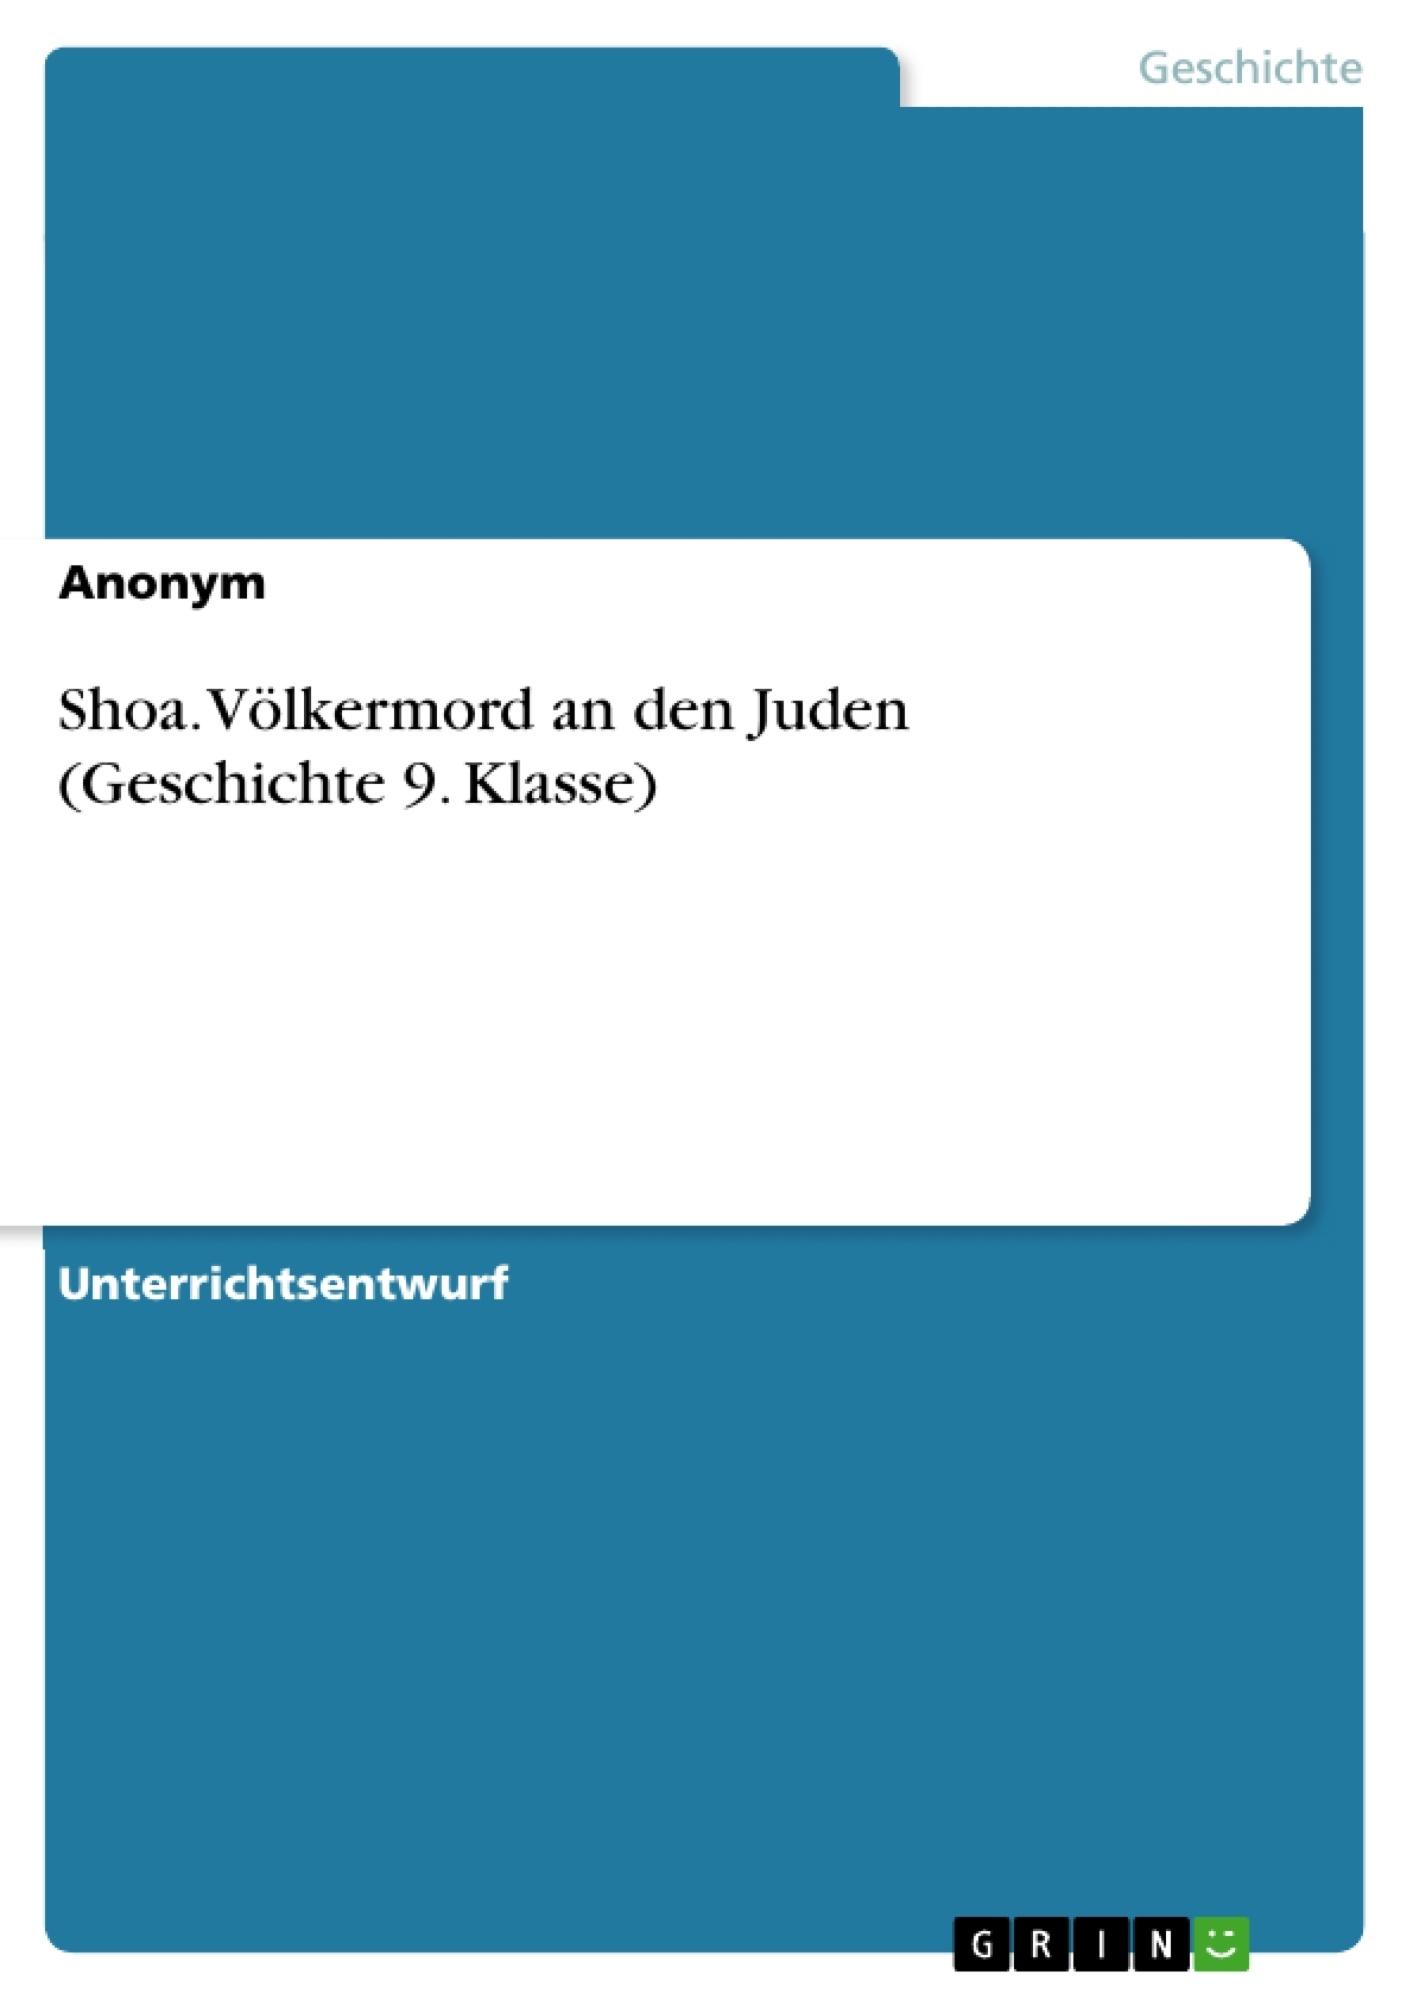 Fantastic Arbeitsblatt 4 Singlereplacement Reaktionen Ornament ...